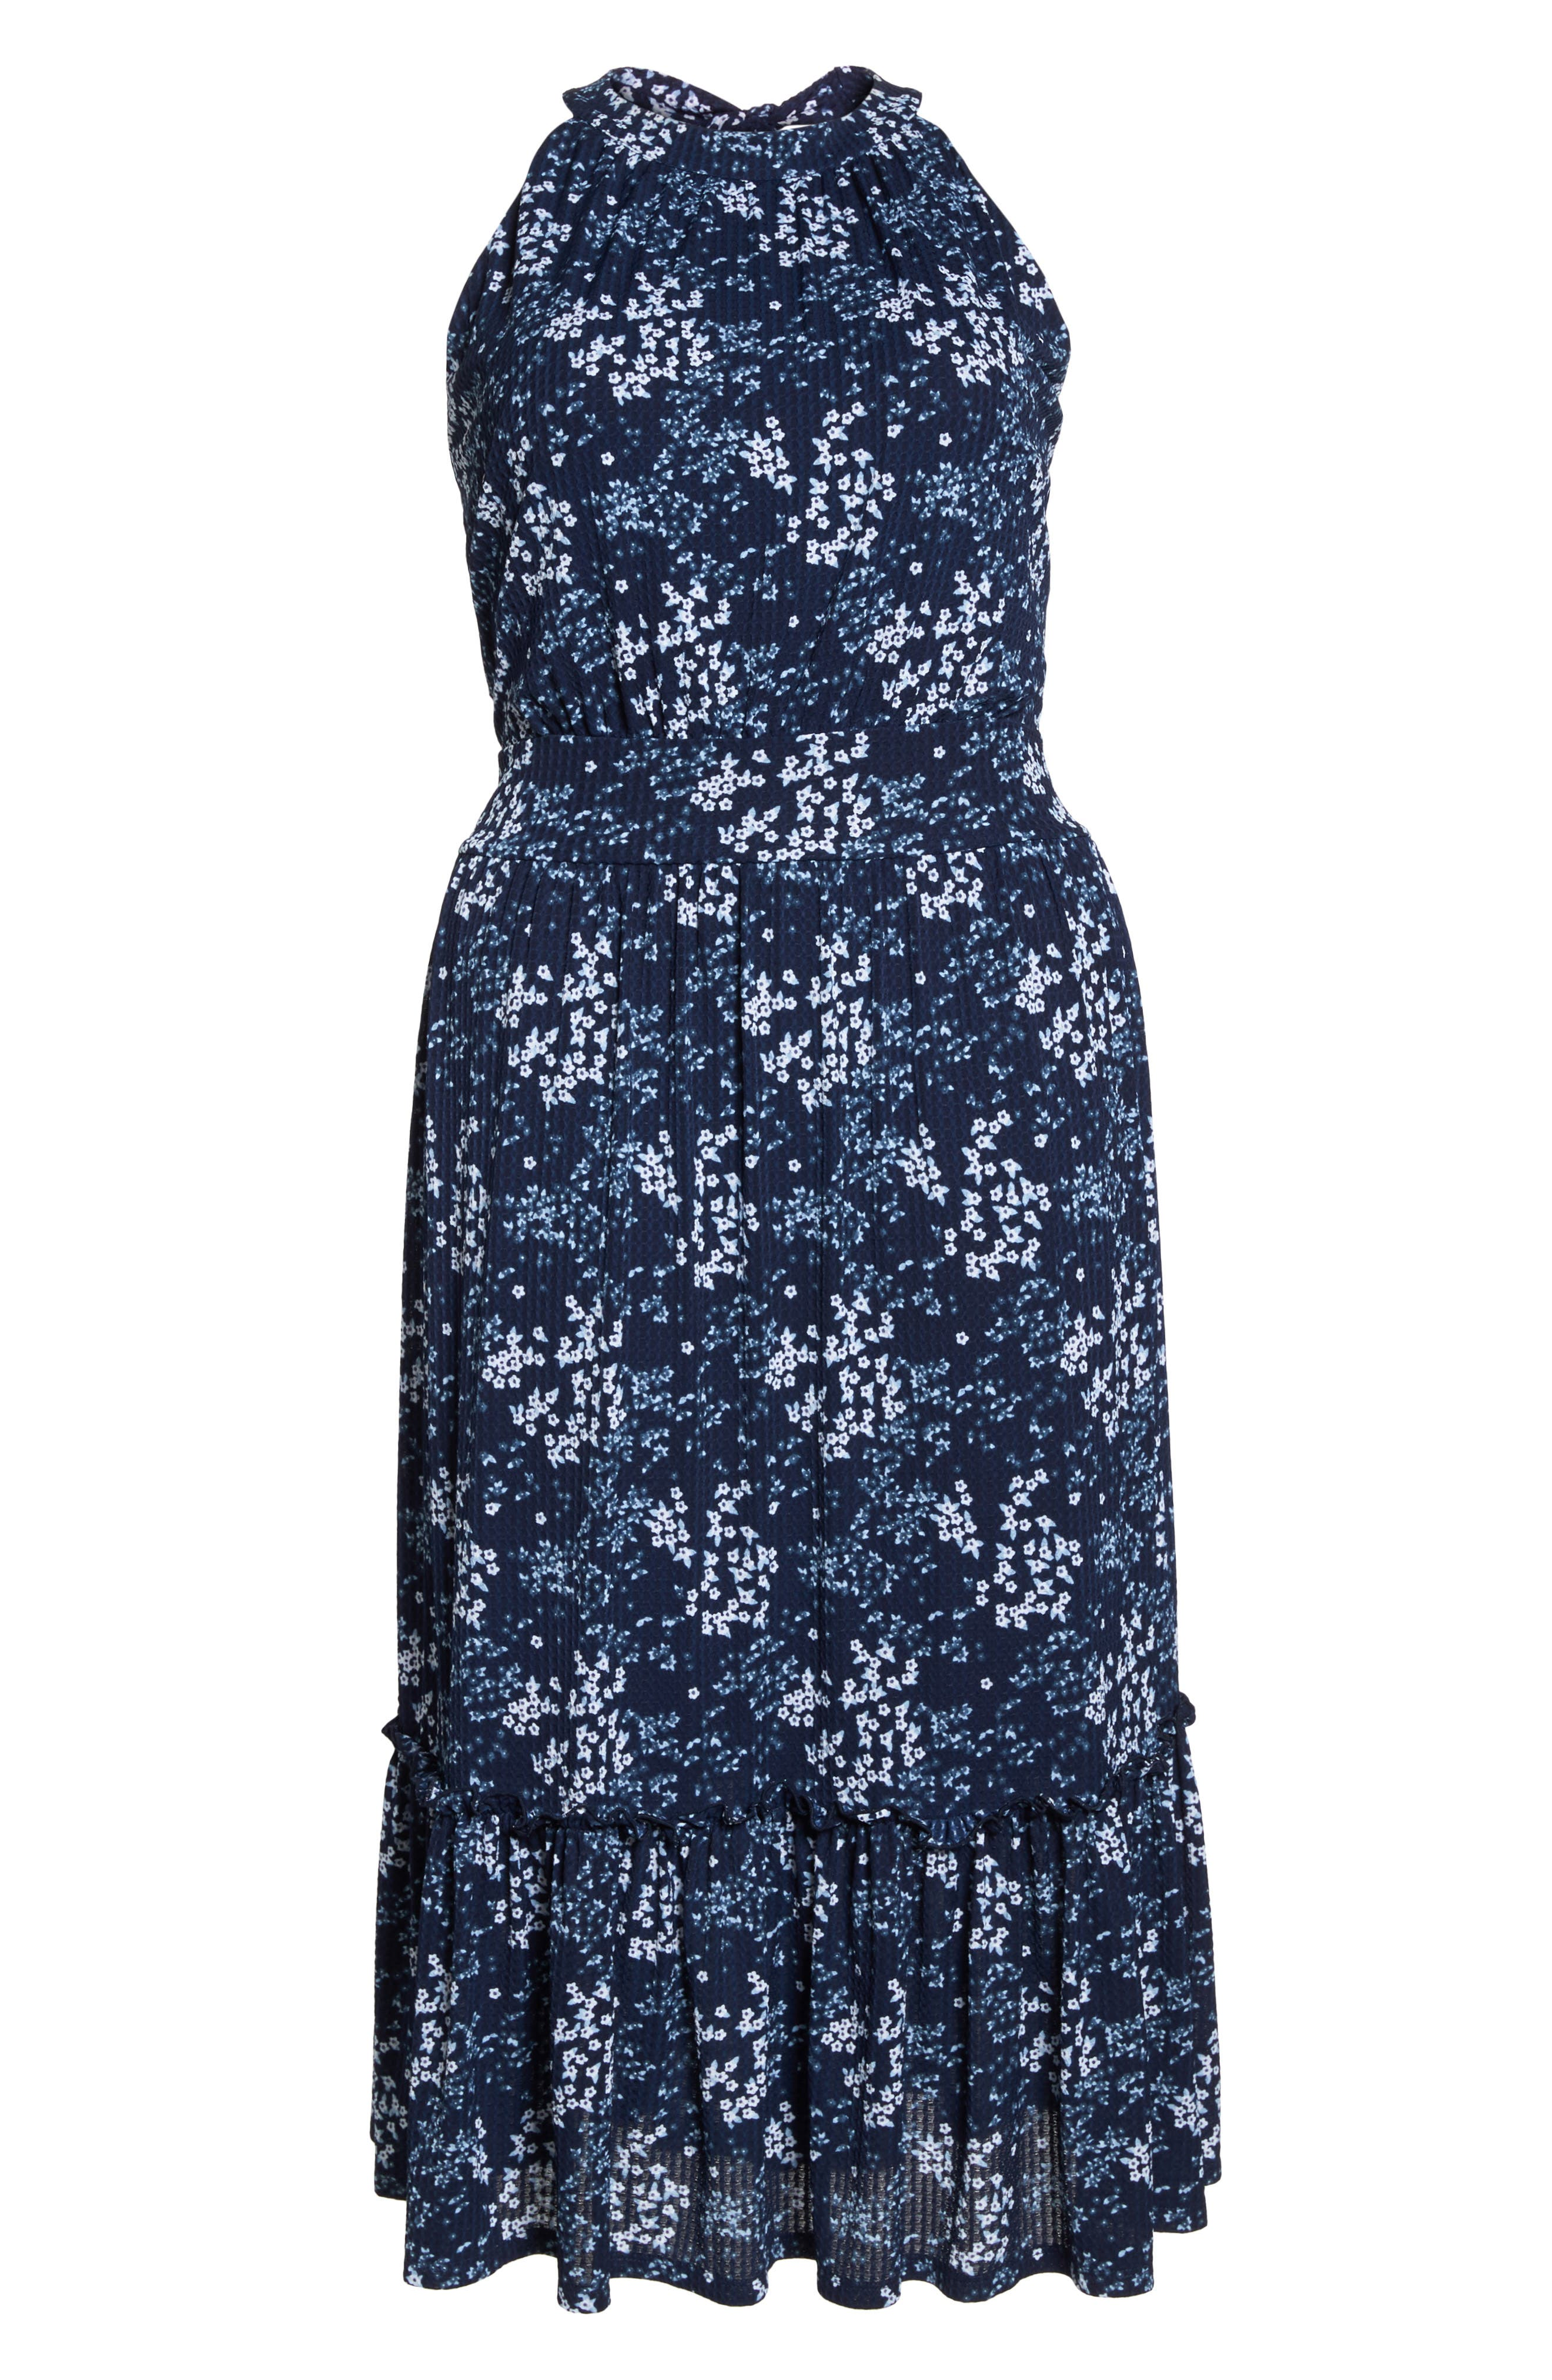 Floral Tiered Midi Halter Dress,                             Alternate thumbnail 7, color,                             454